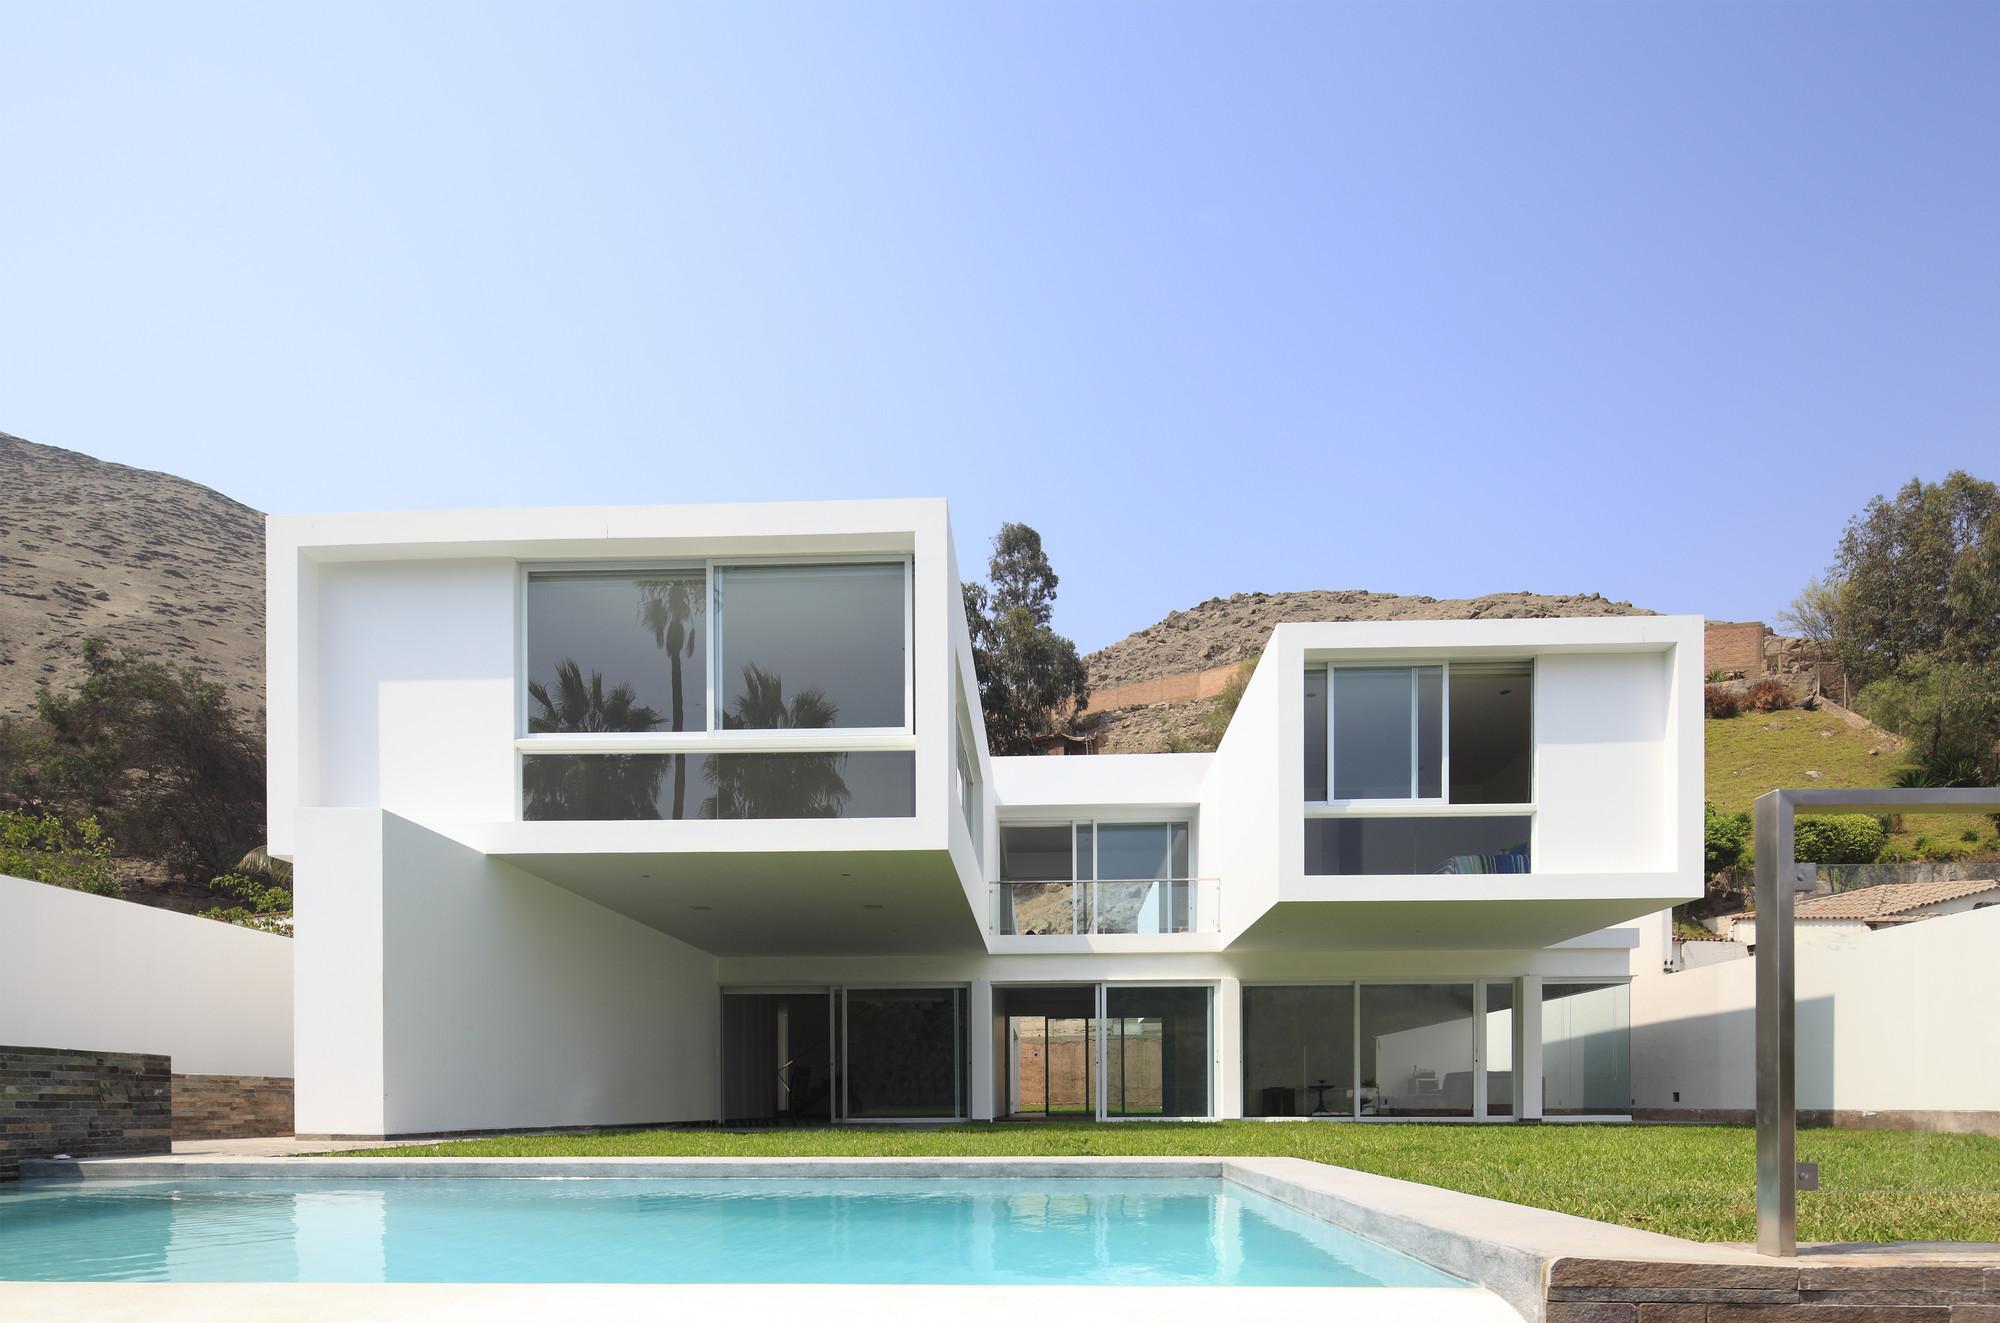 Casa Golf / Seinfeld Arquitectos, © Juan Solano